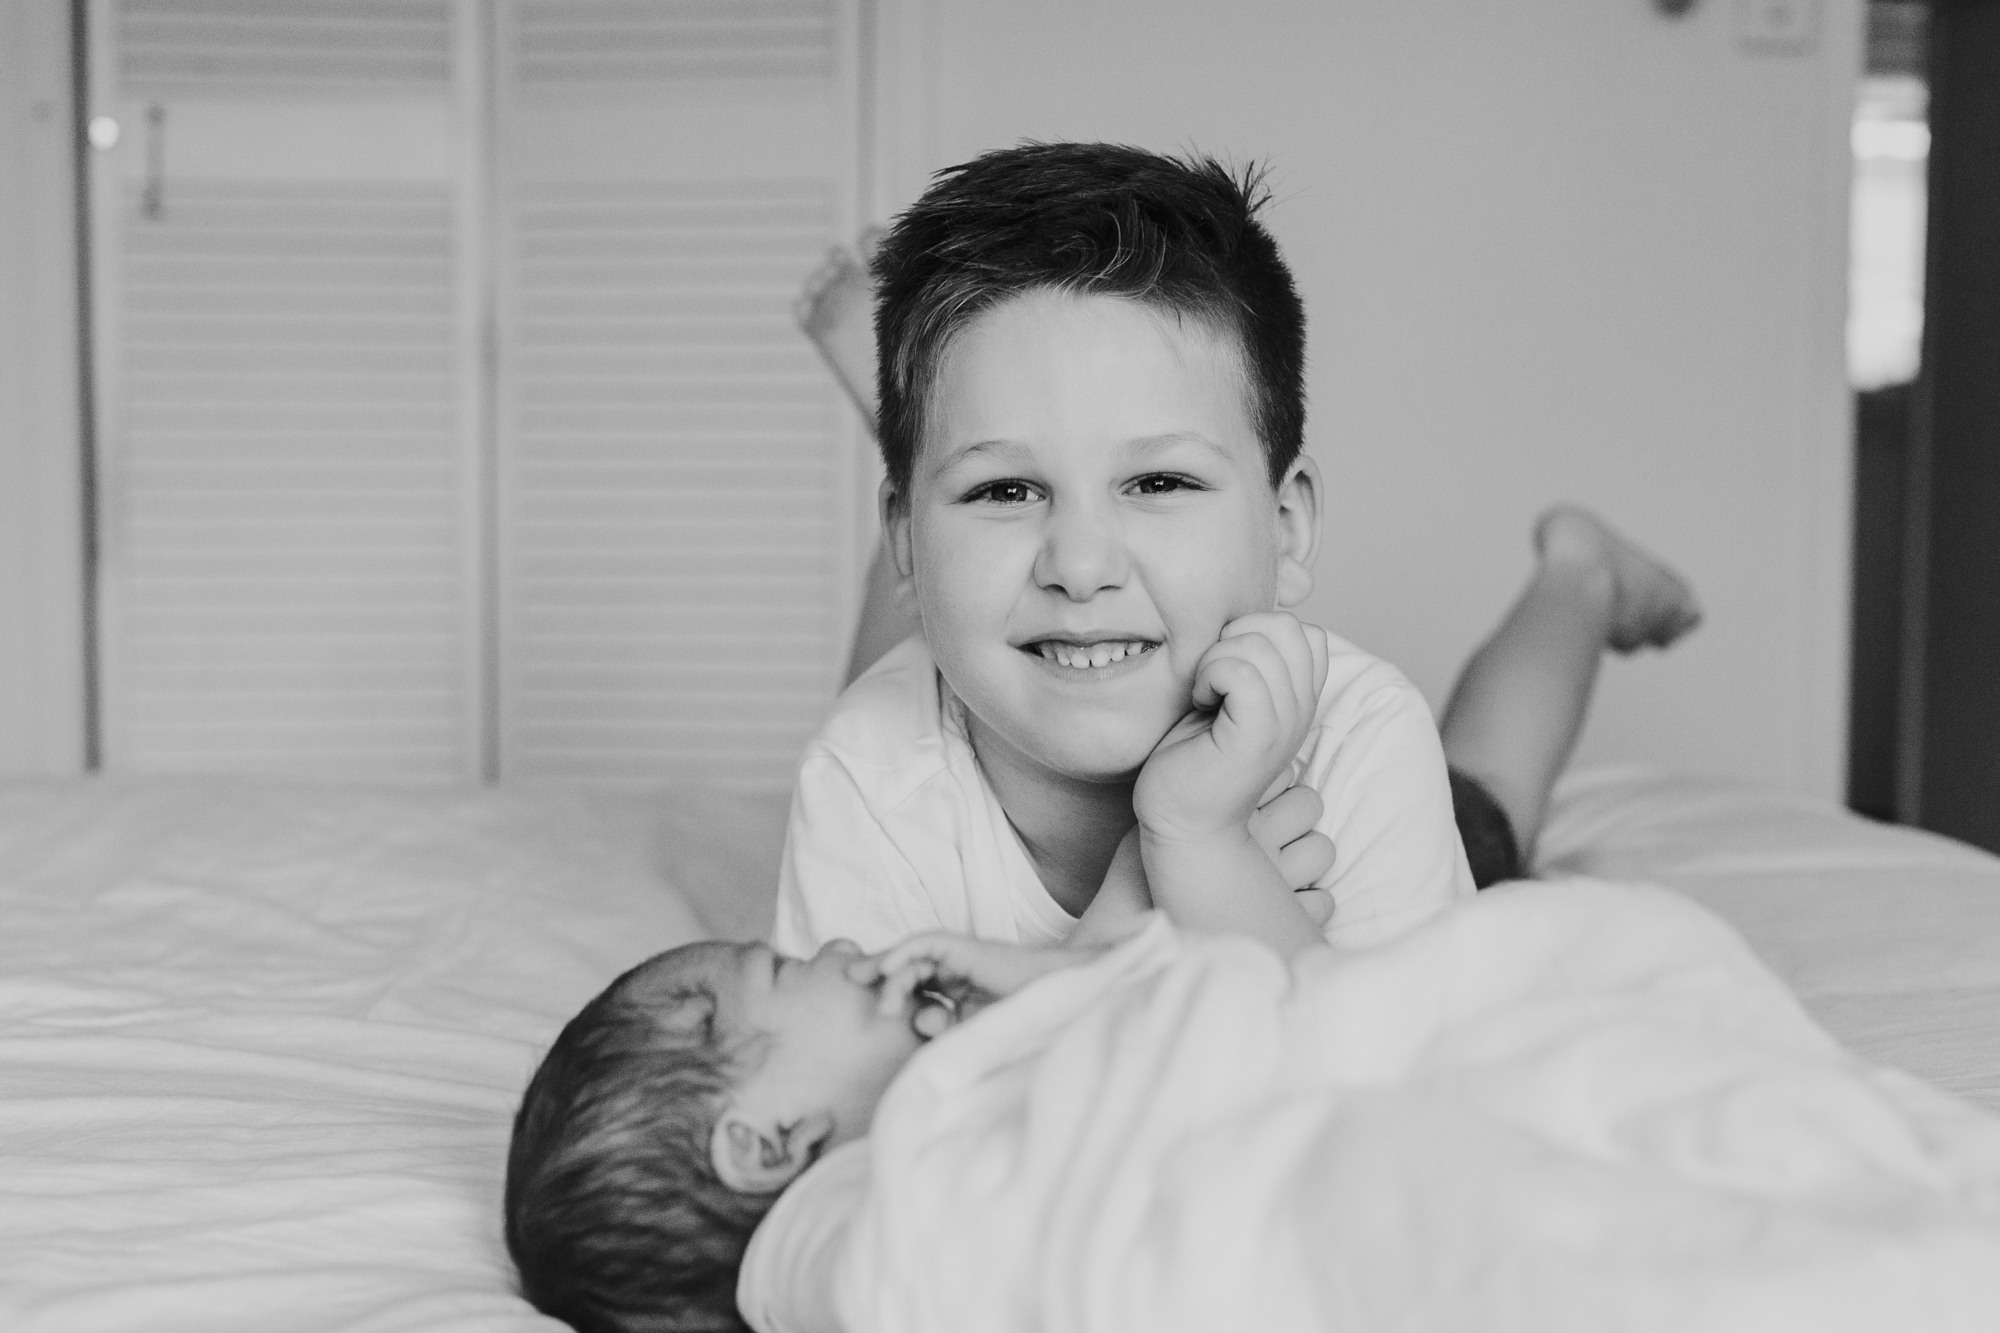 Brisbane newborn photographer kym renay.parker.new 010.jpg